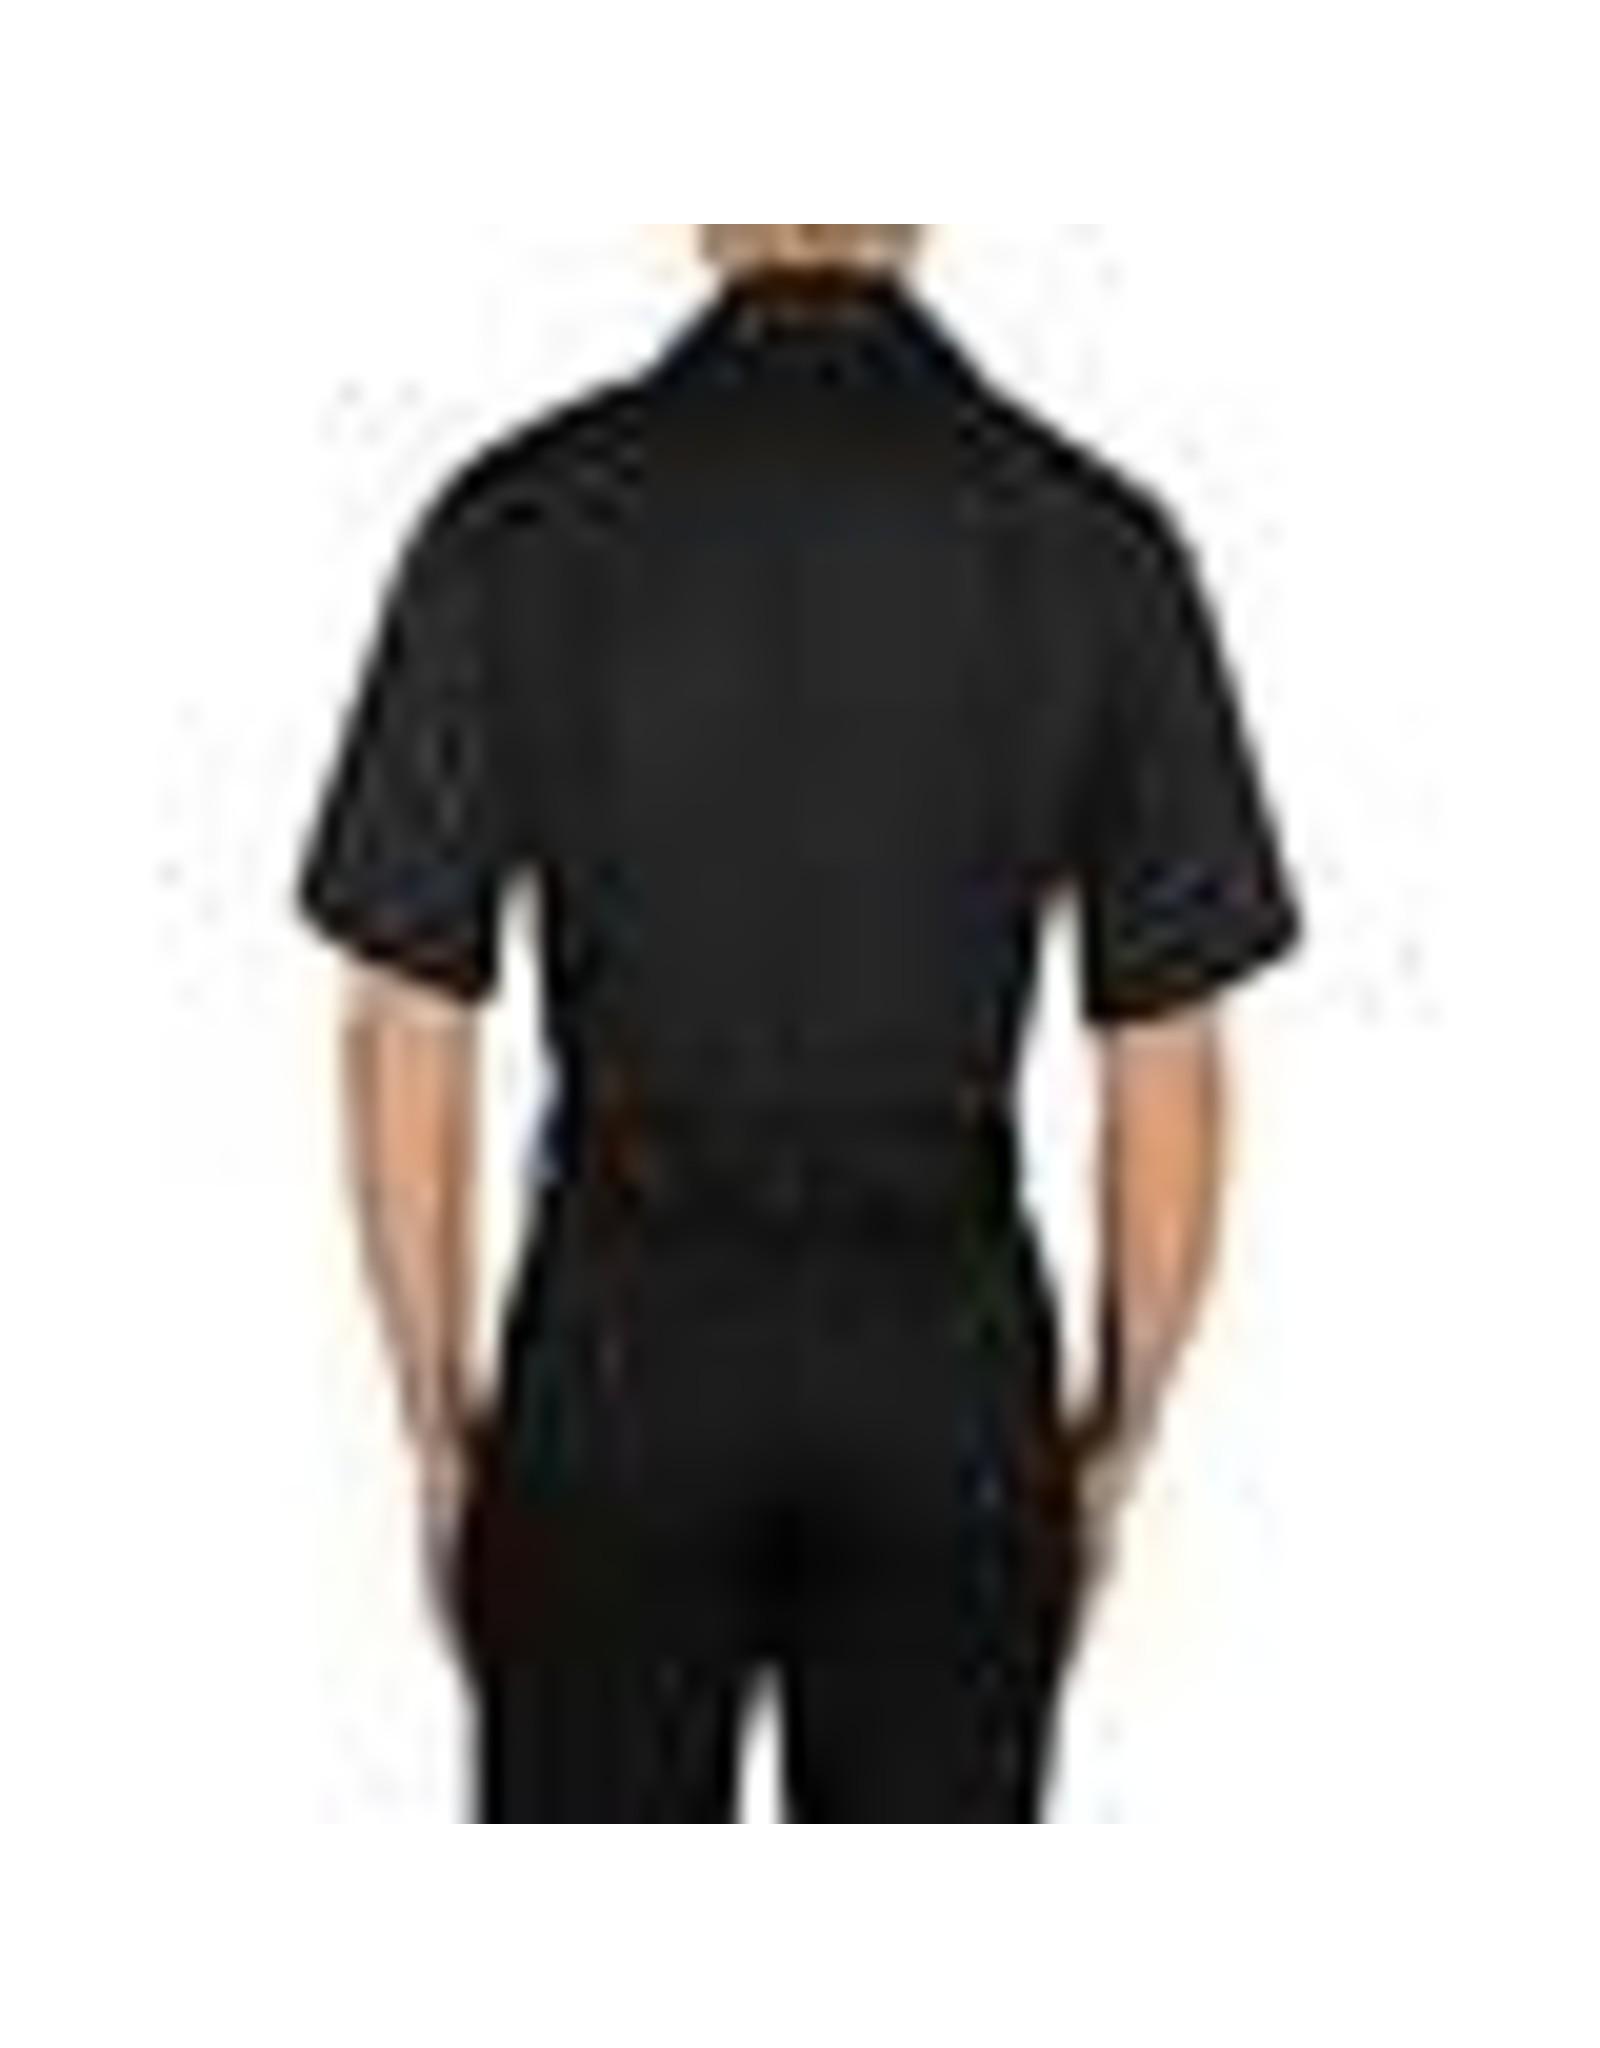 United Uniform Shirt XL